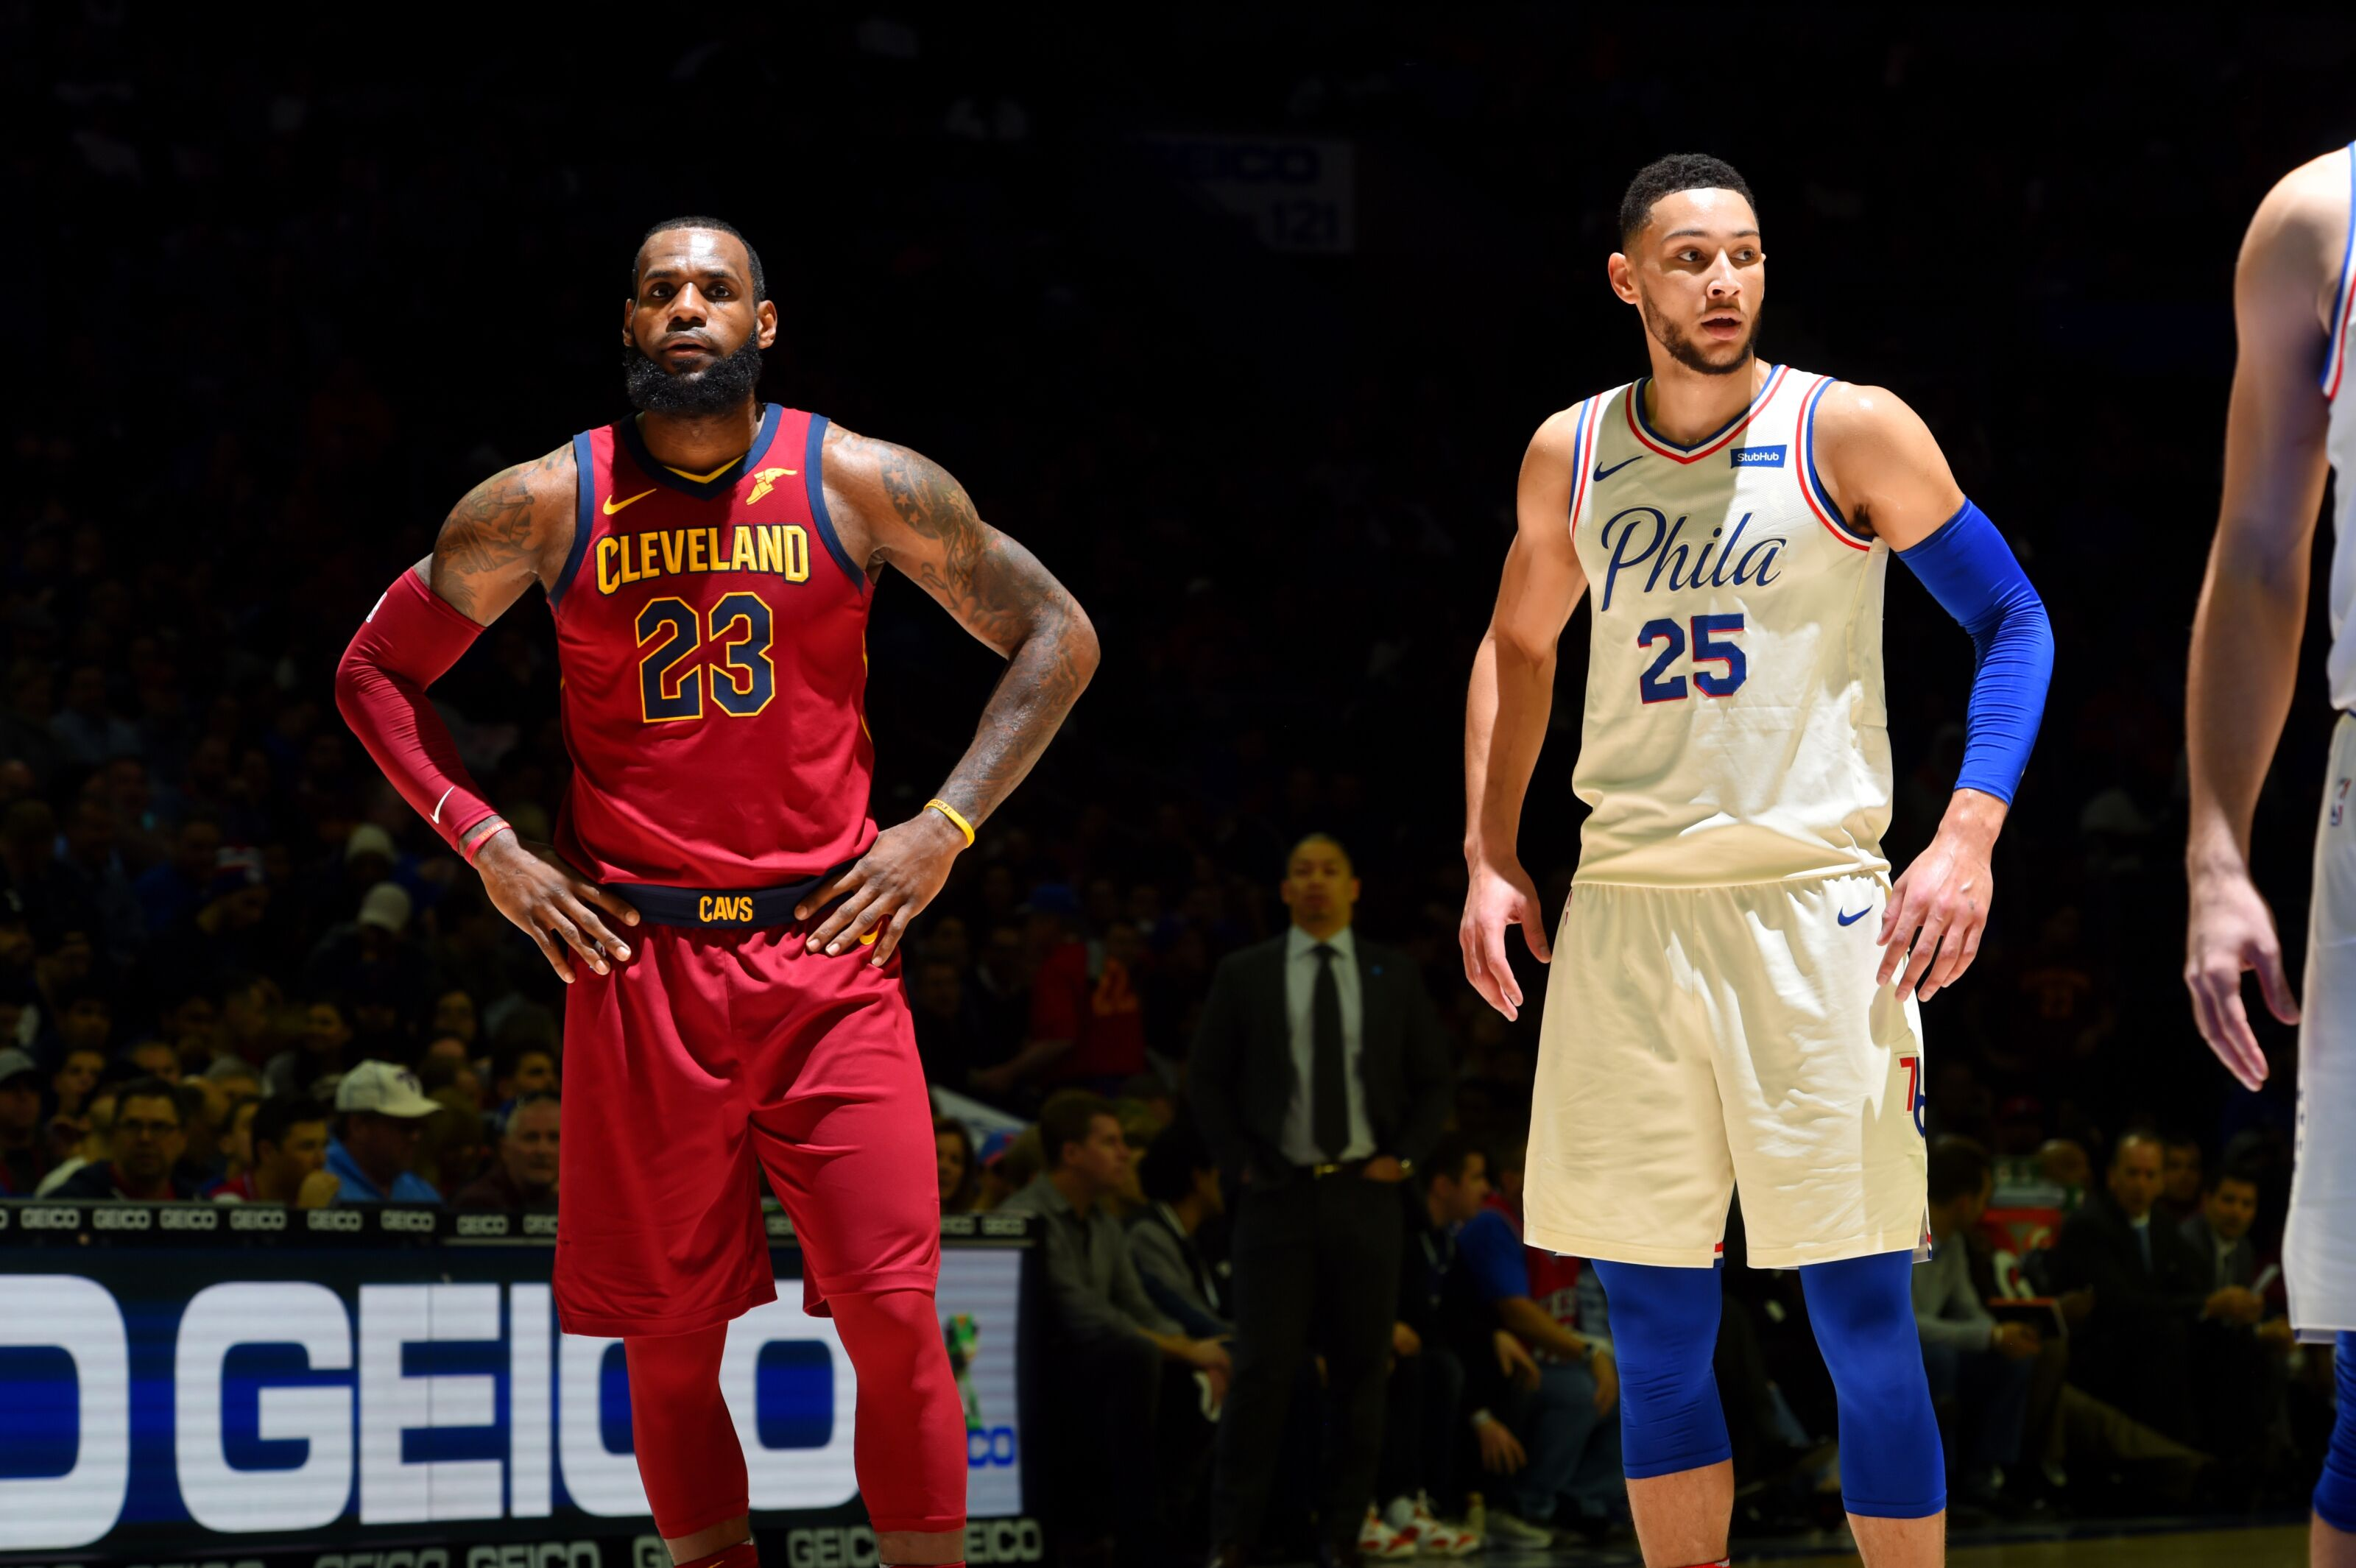 a2c7f00a99c3 Philadelphia 76ers  LeBron-to-L.A. opens Sixers championship window